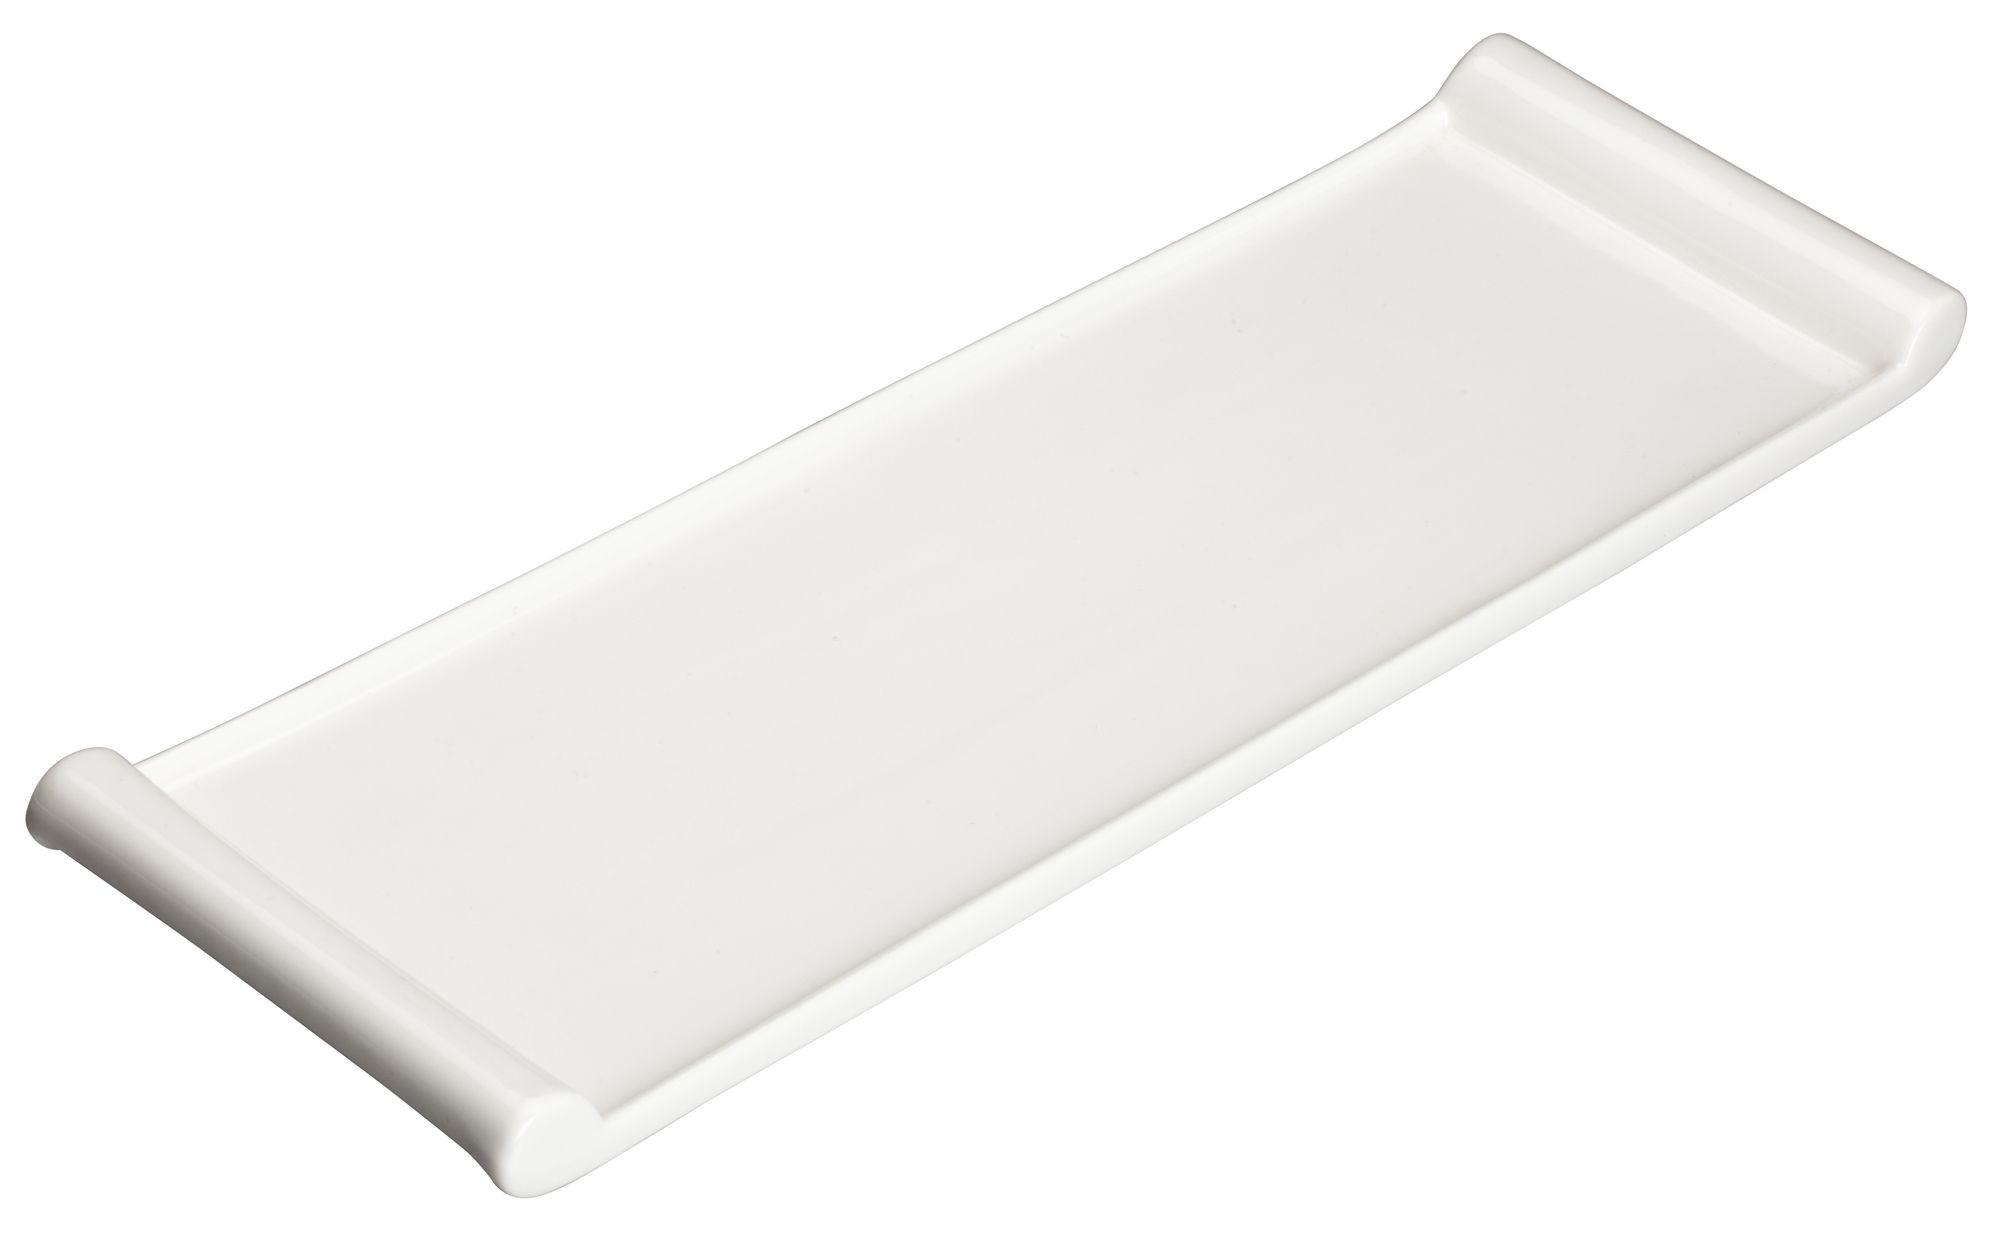 "Winco WDP017-118 Paredes Porcelain Bright White Rectangular Platter 18-1/8"" x 5-3/8"""